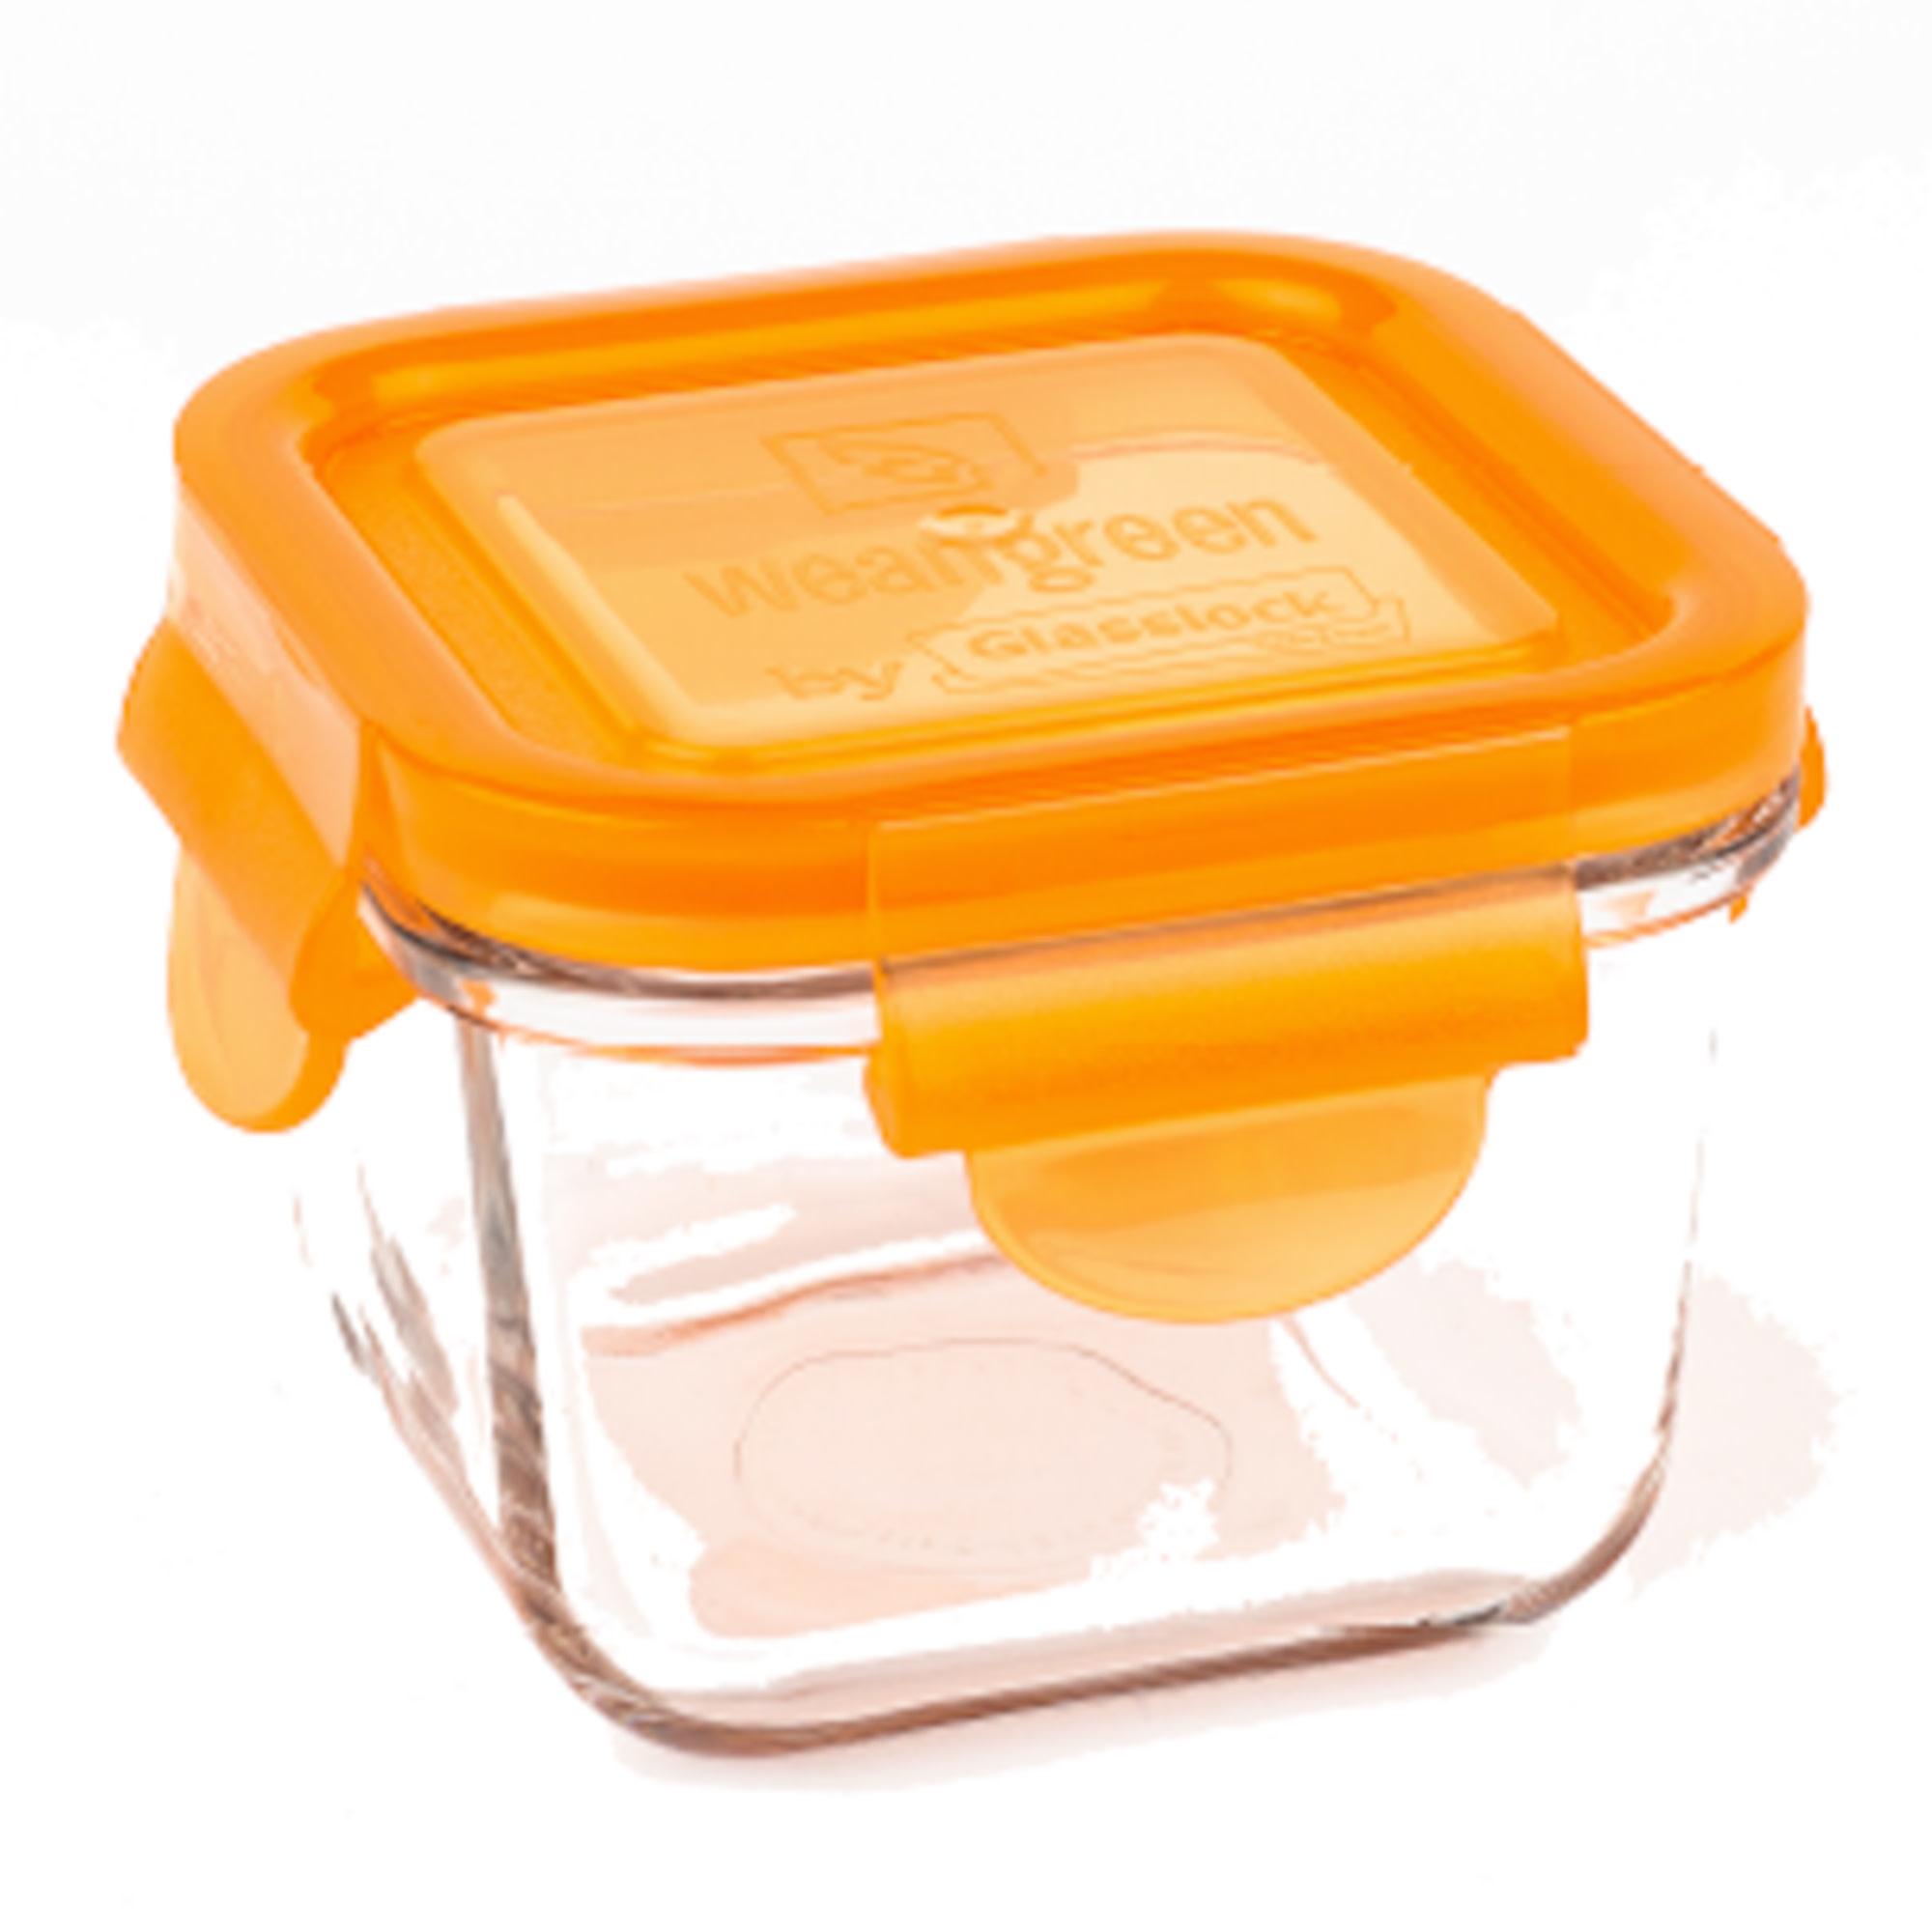 Wean Green 7 oz. Snack Cube - Carrot